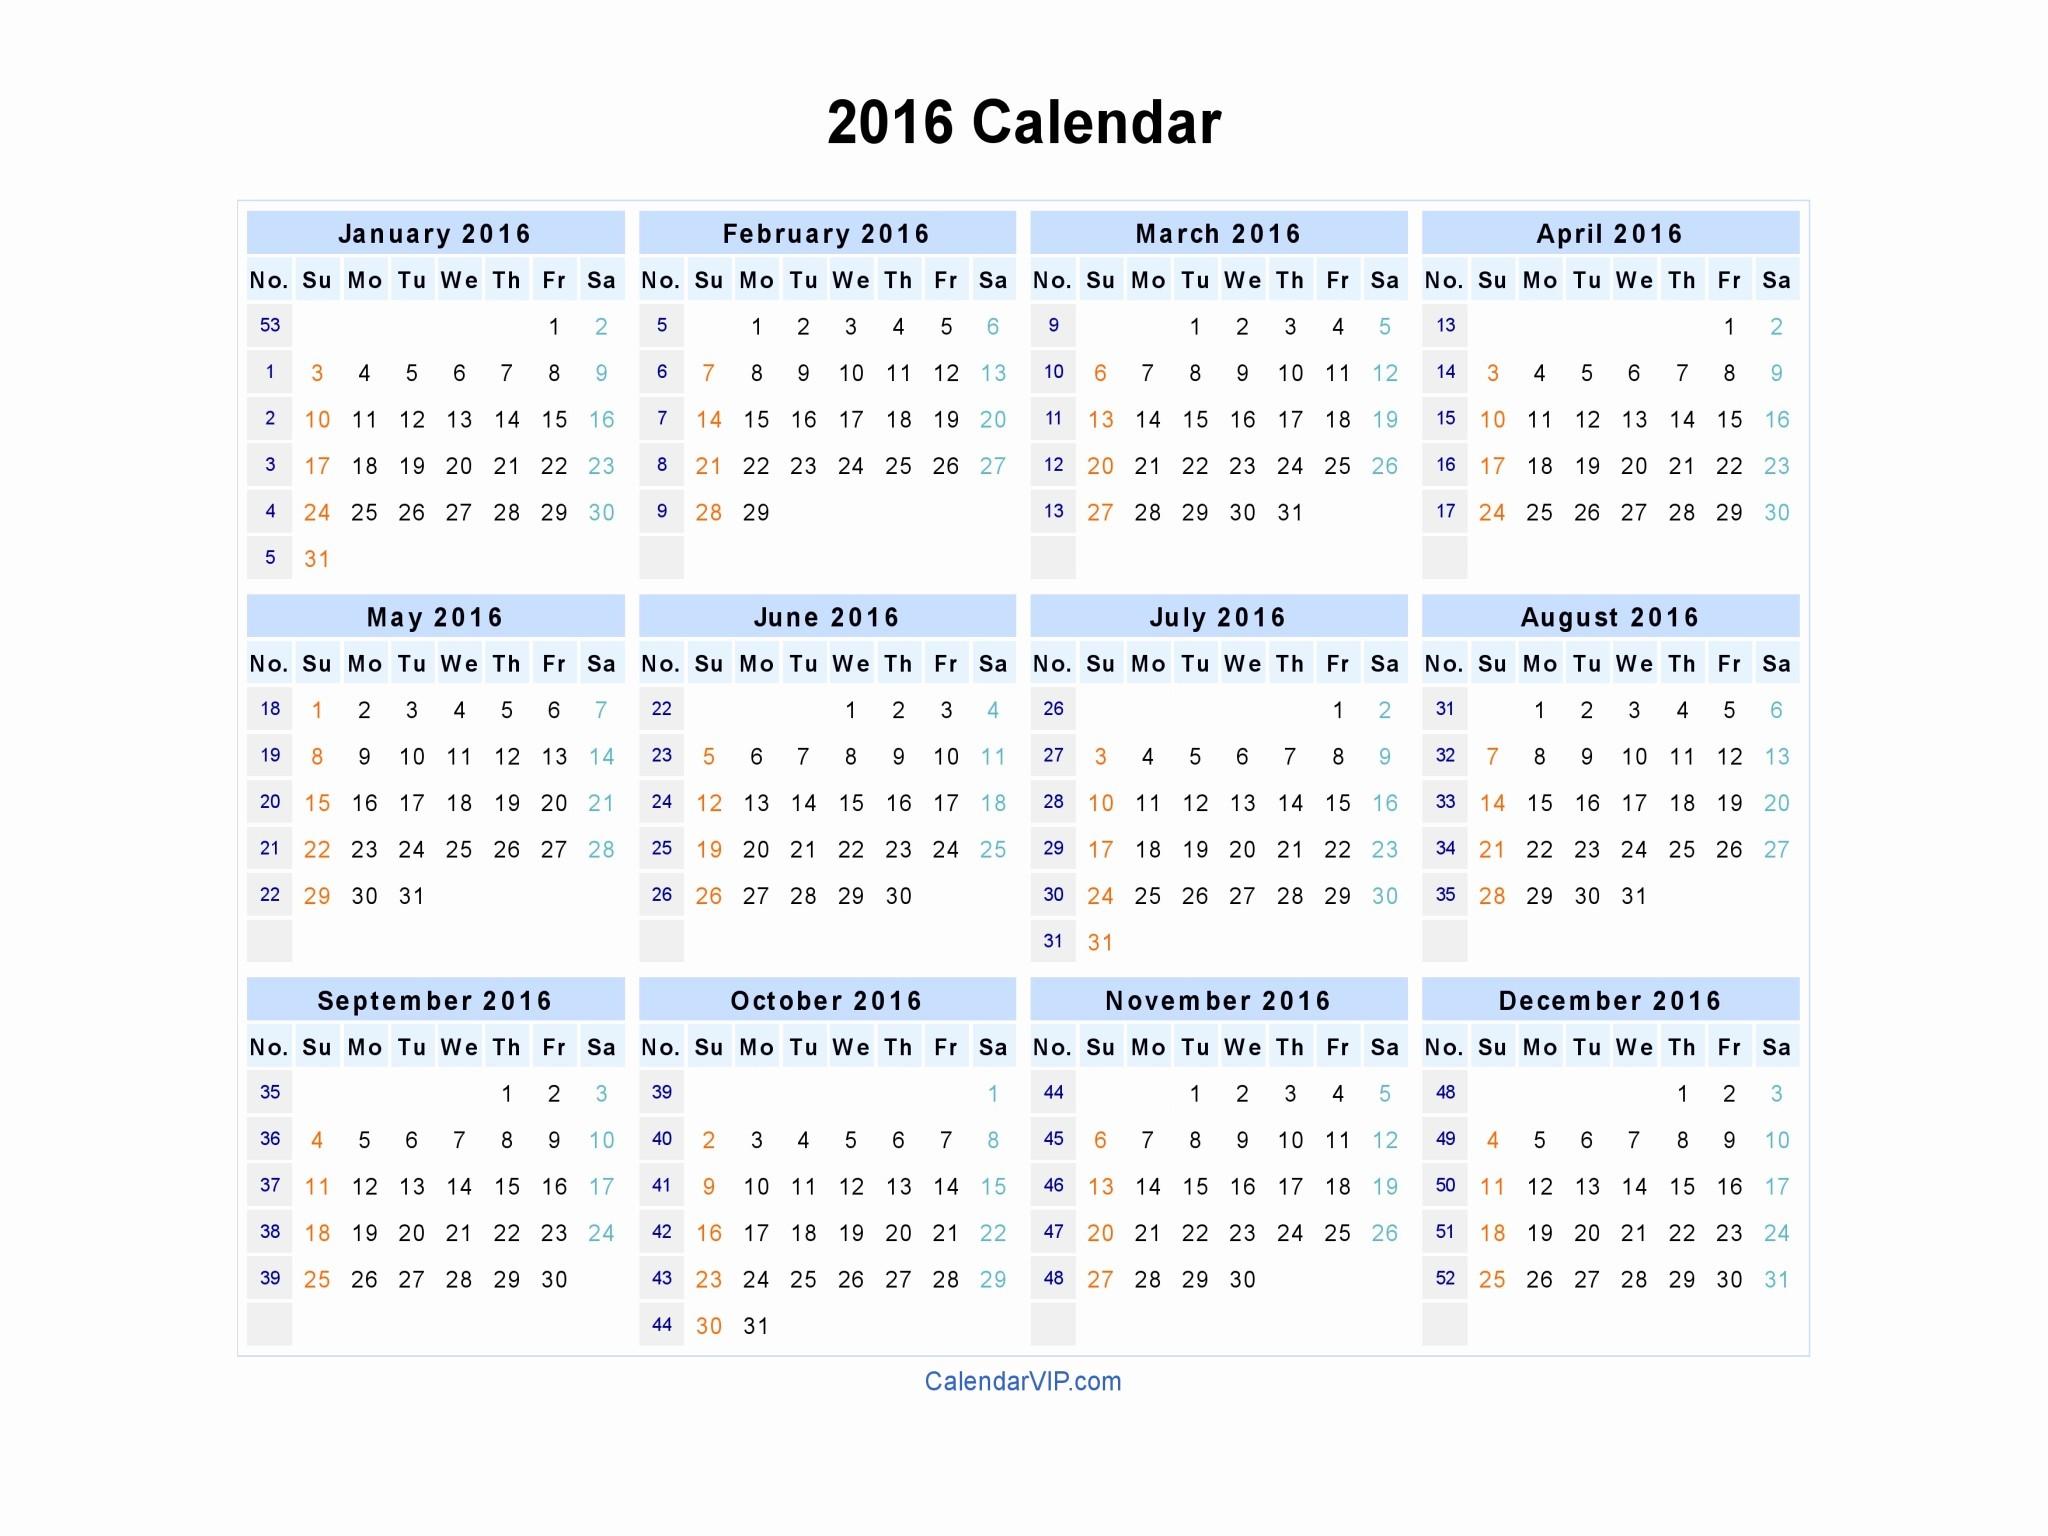 2016 Calendar Excel with Holidays Beautiful 2016 Calendar Blank Printable Calendar Template In Pdf